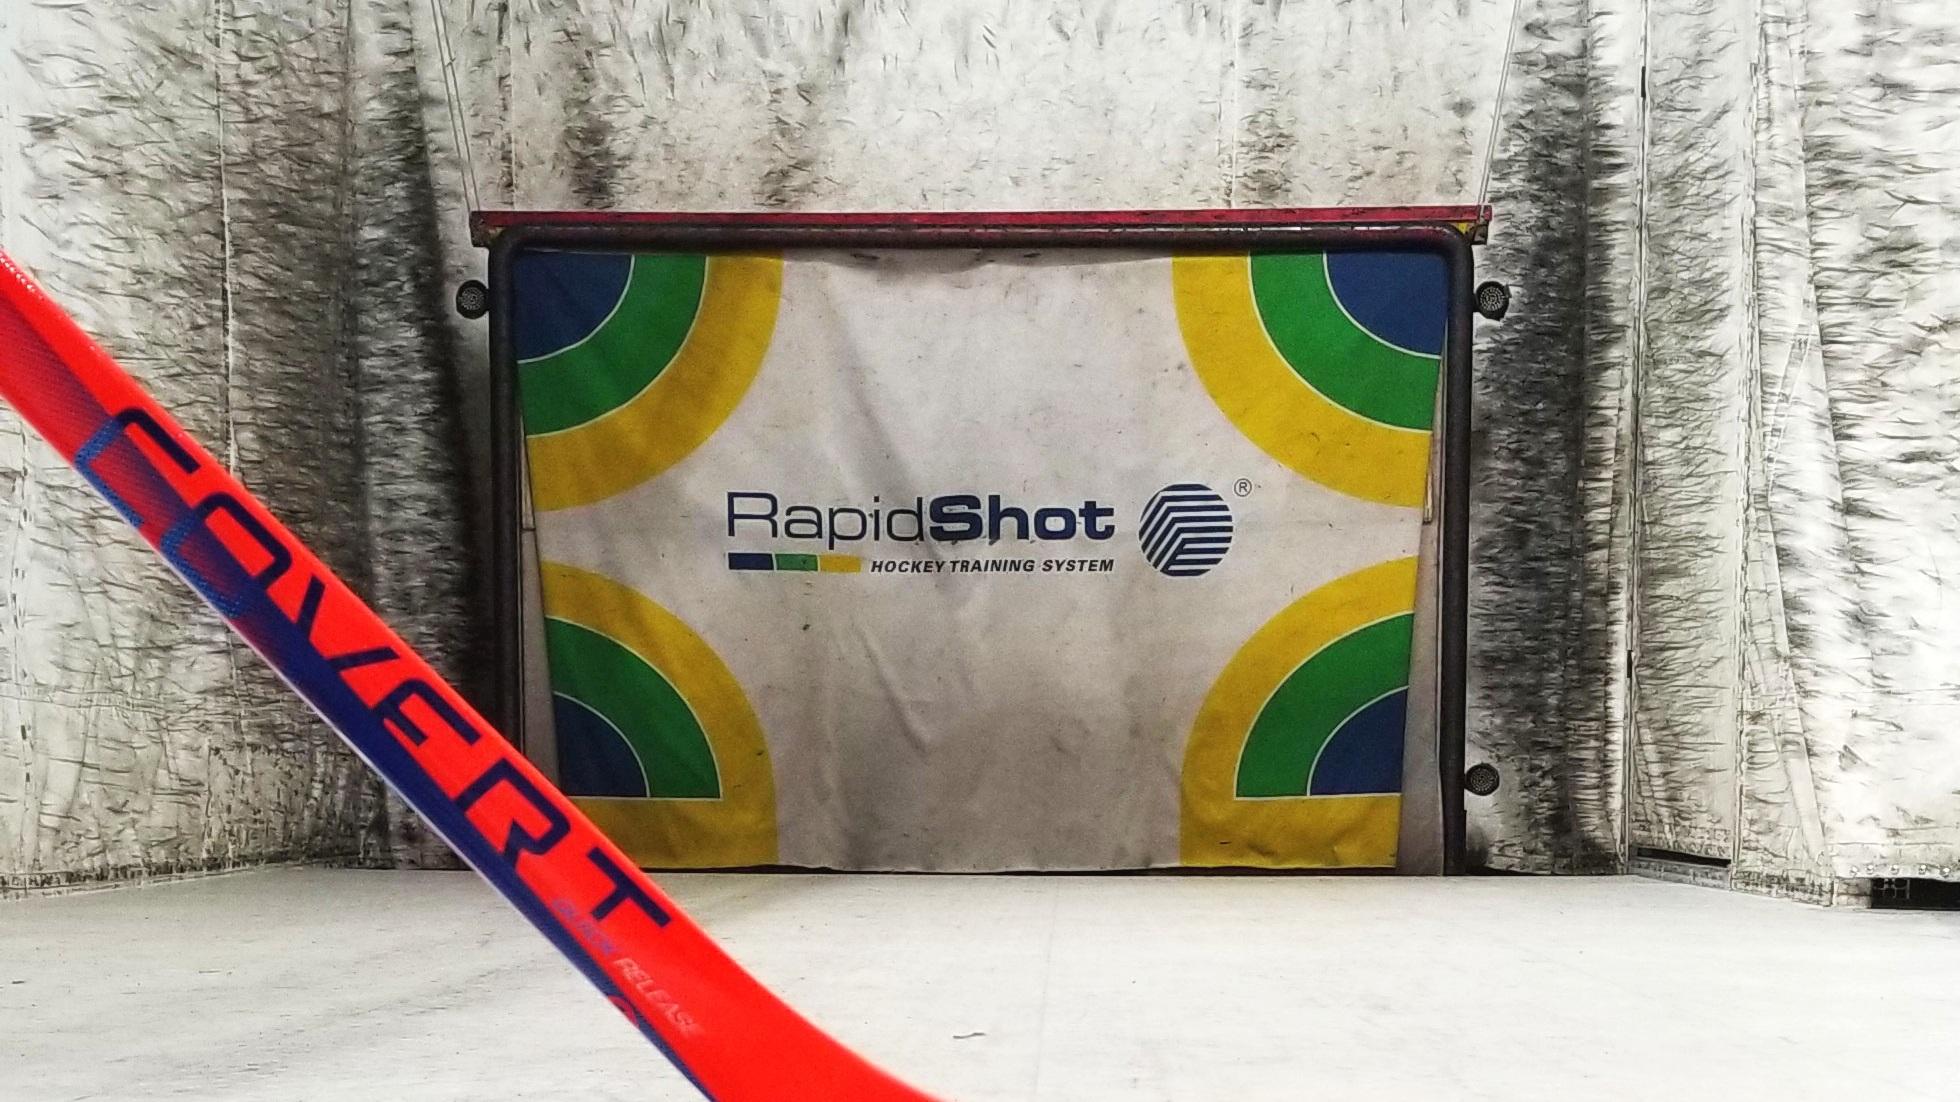 Rapid-shot.jpg